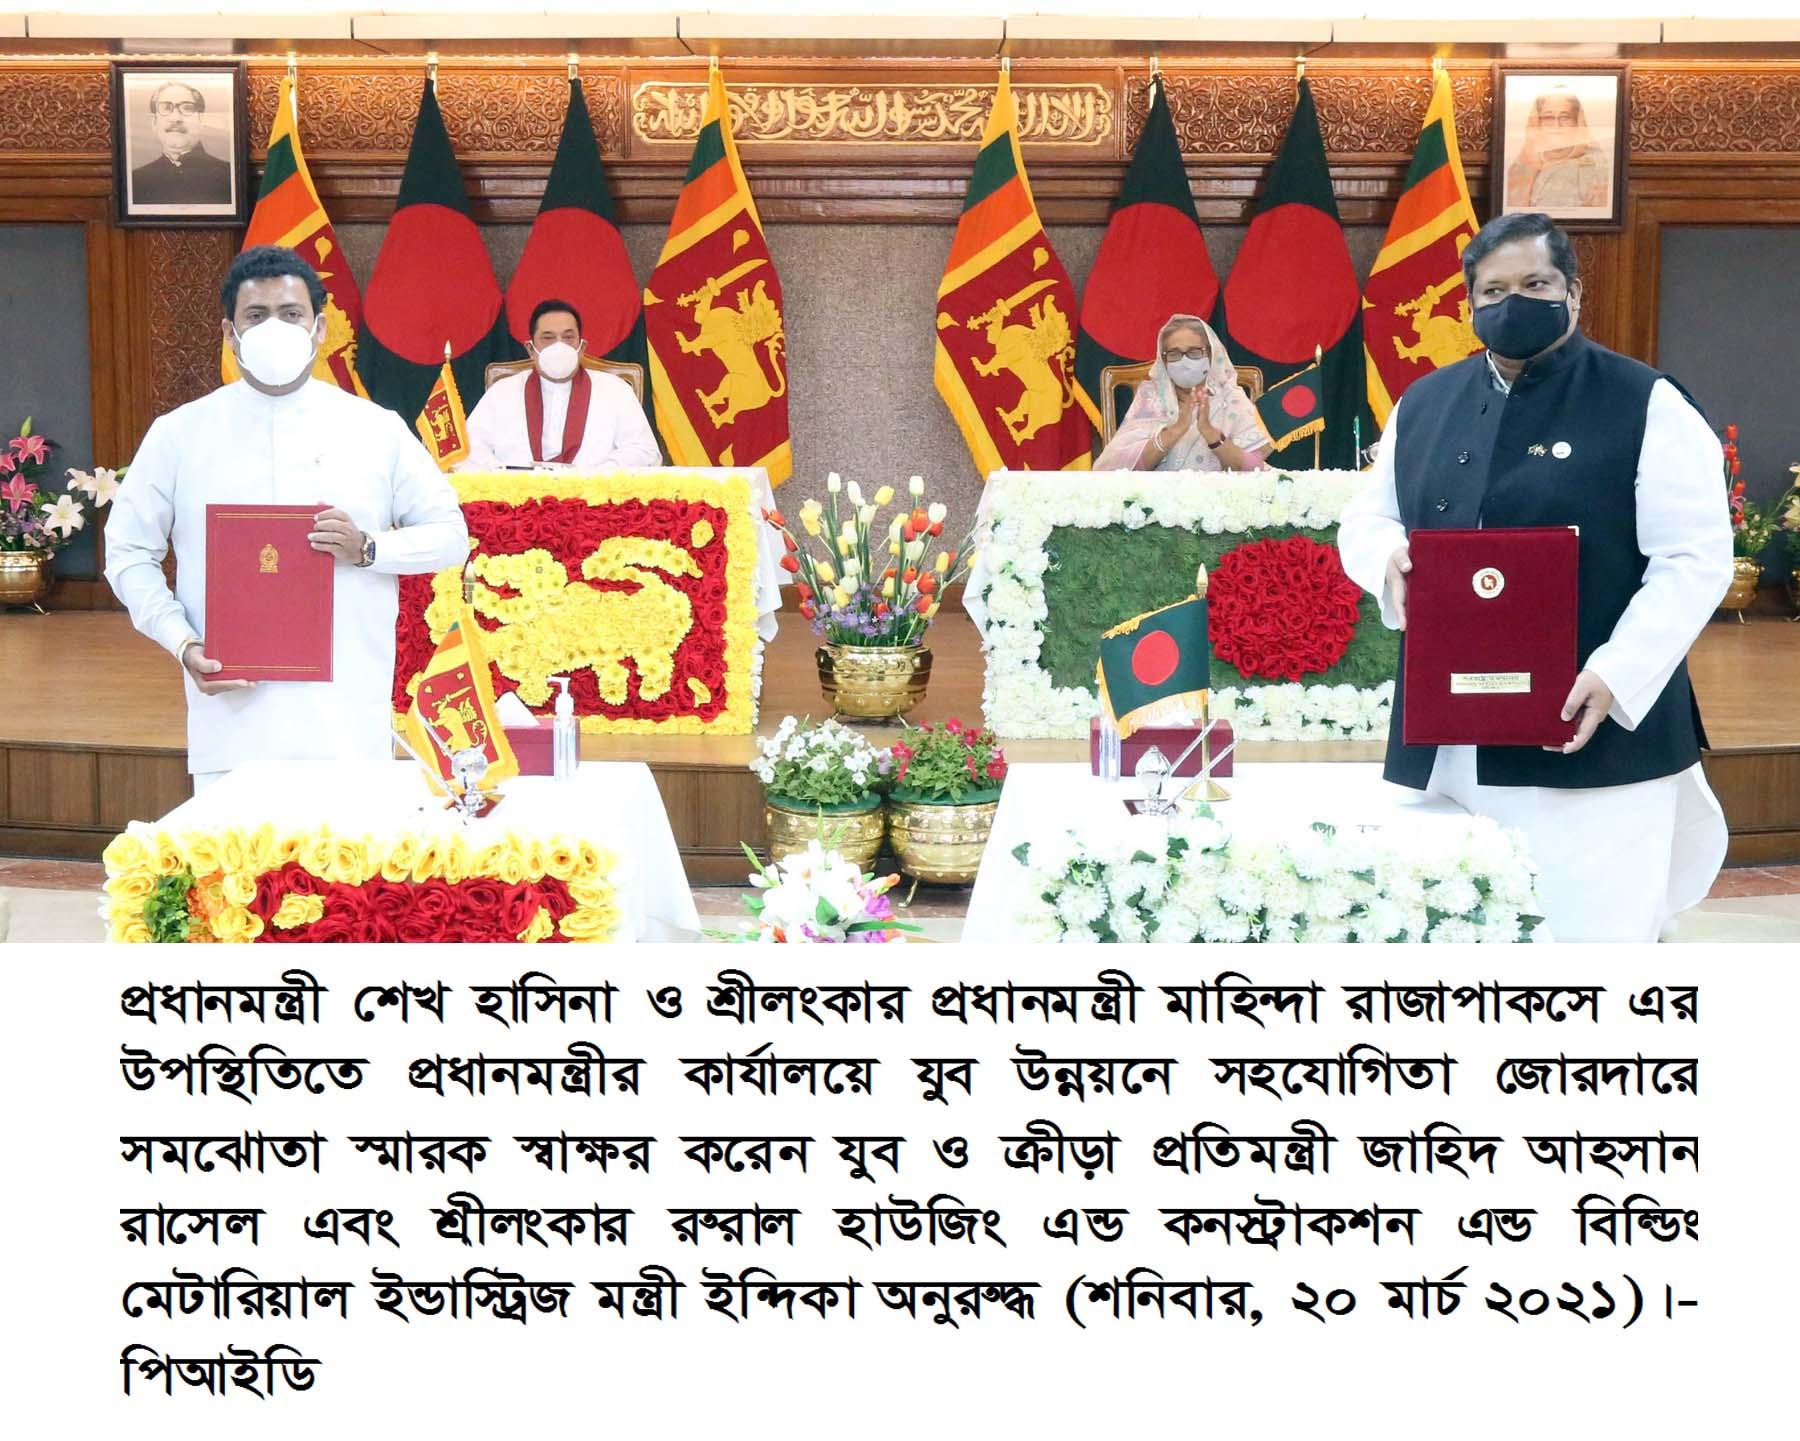 Sri Lankan PM in Bangladesh